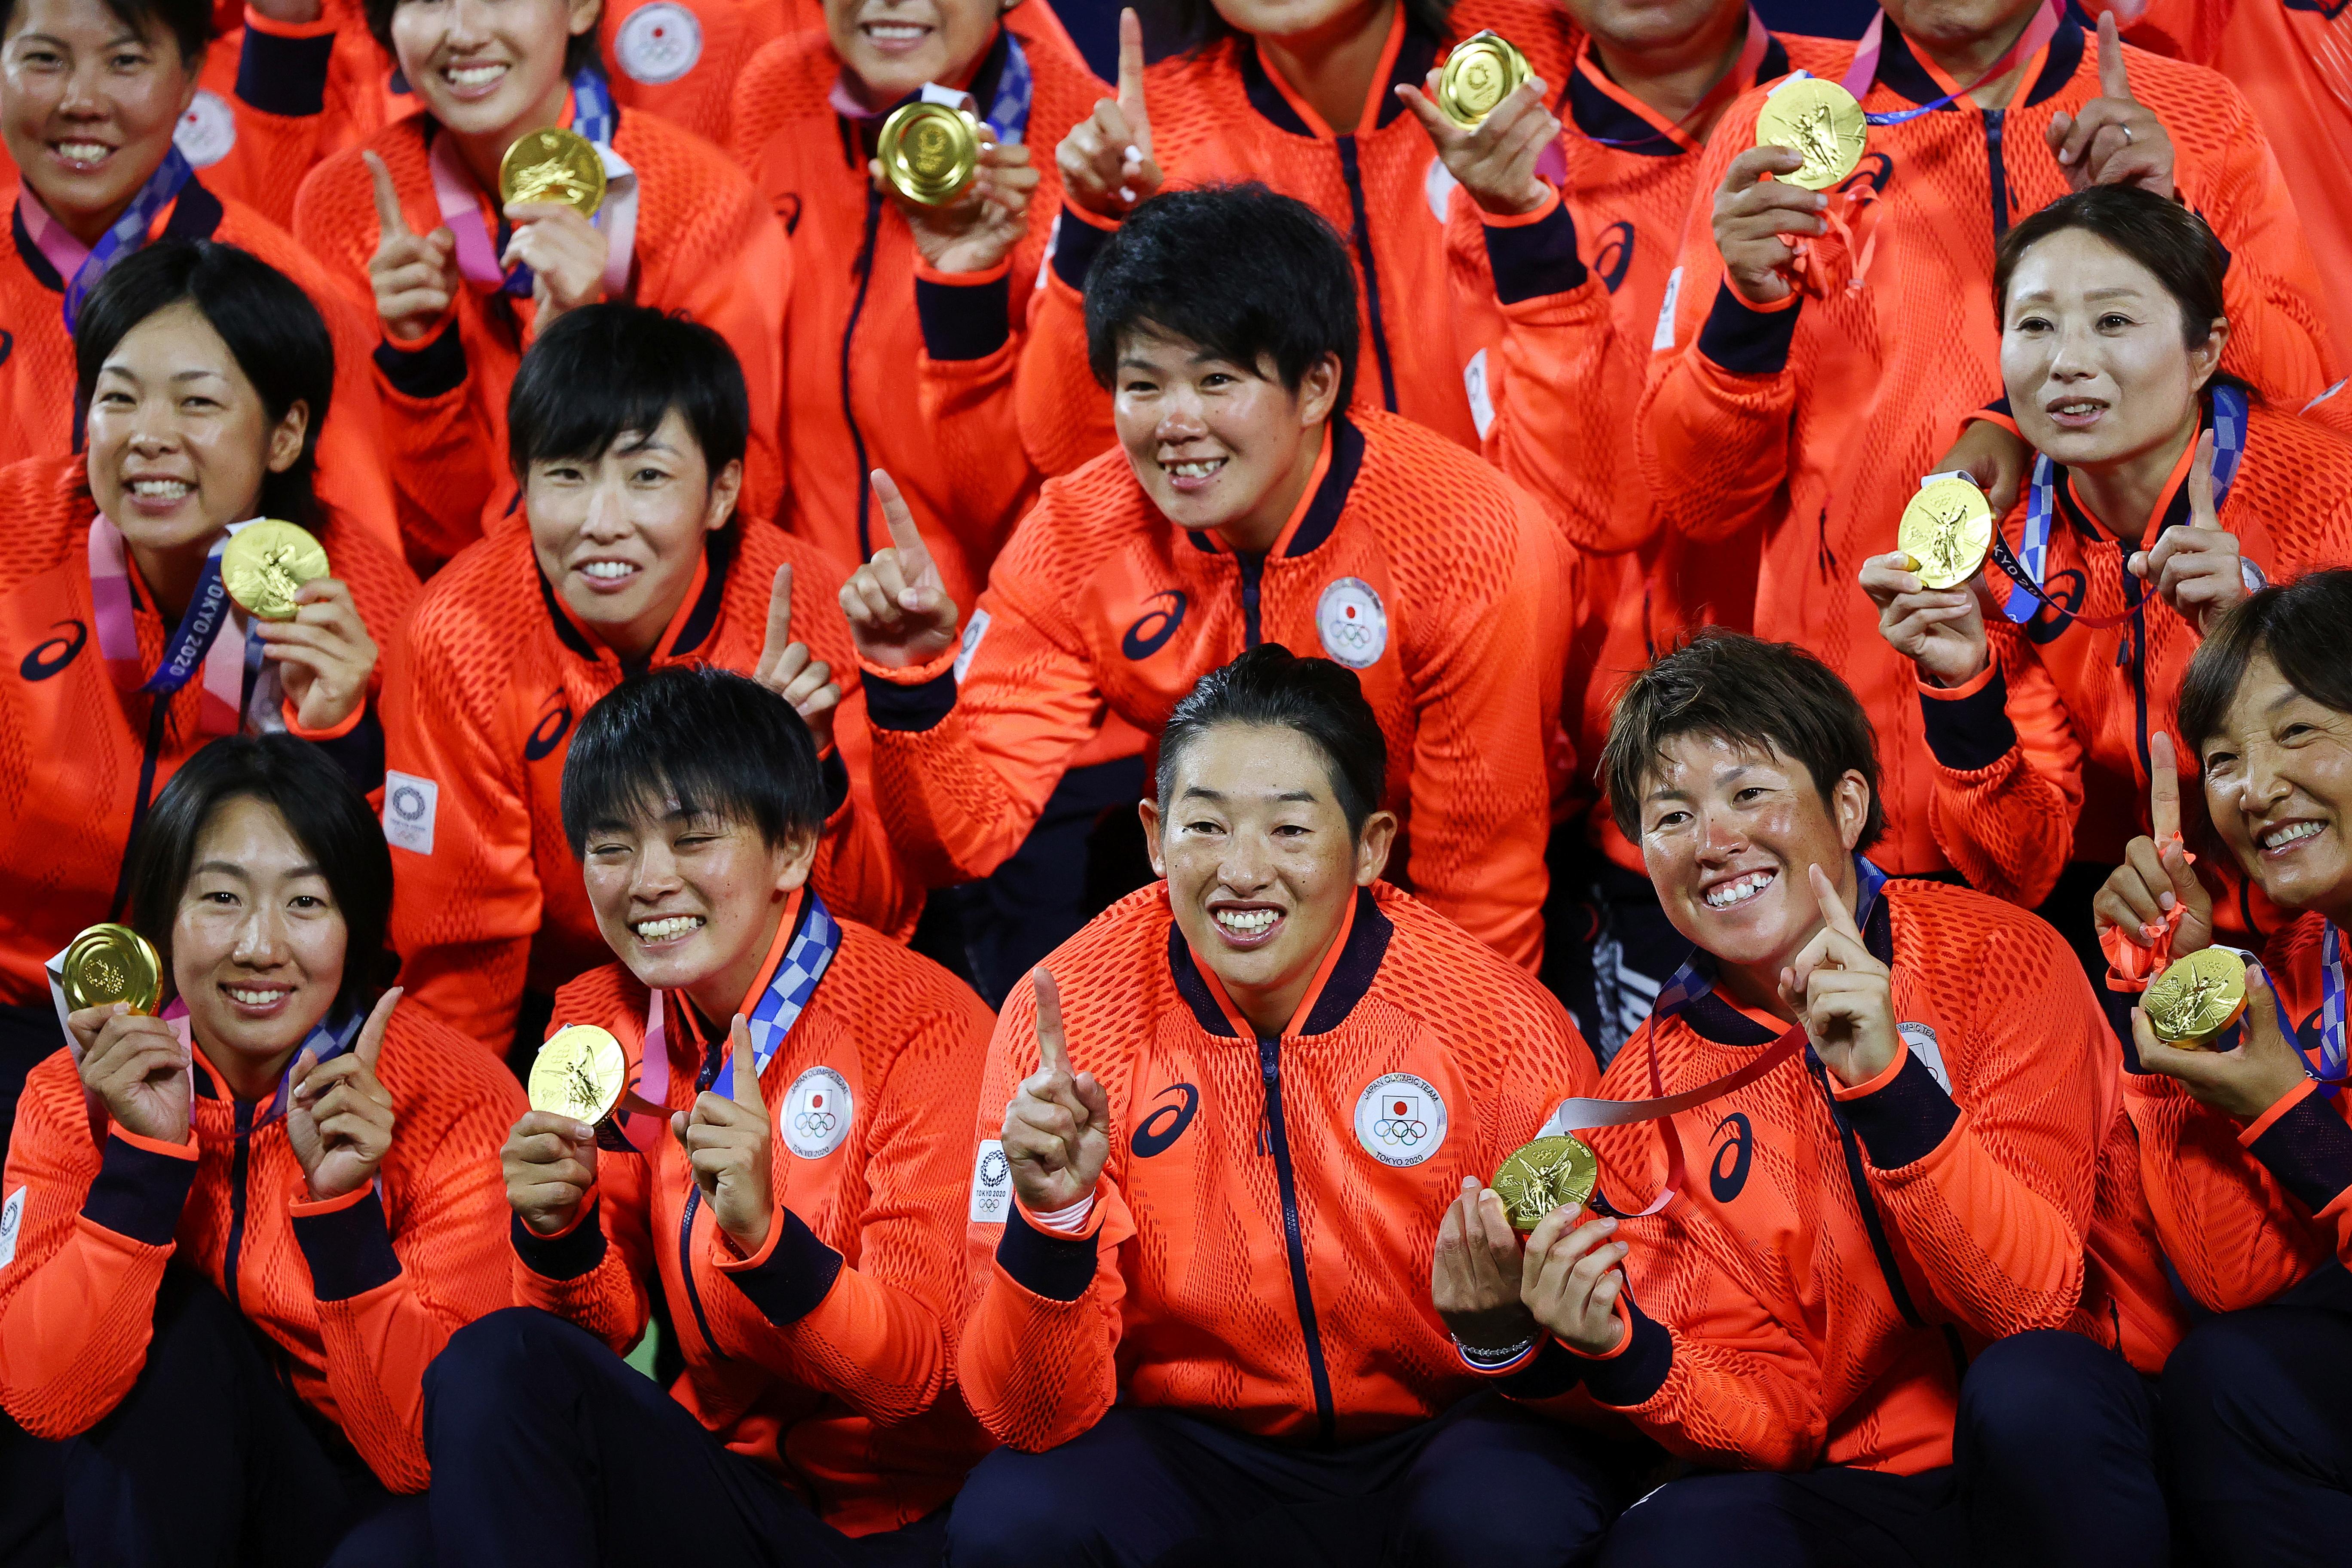 Tokyo 2020 Olympics - Softball - Women - Medal Ceremony - Yokohama Baseball Stadium - Yokohama, Japan - July 27, 2021. Japan players pose with their gold medals. REUTERS/Jorge Silva